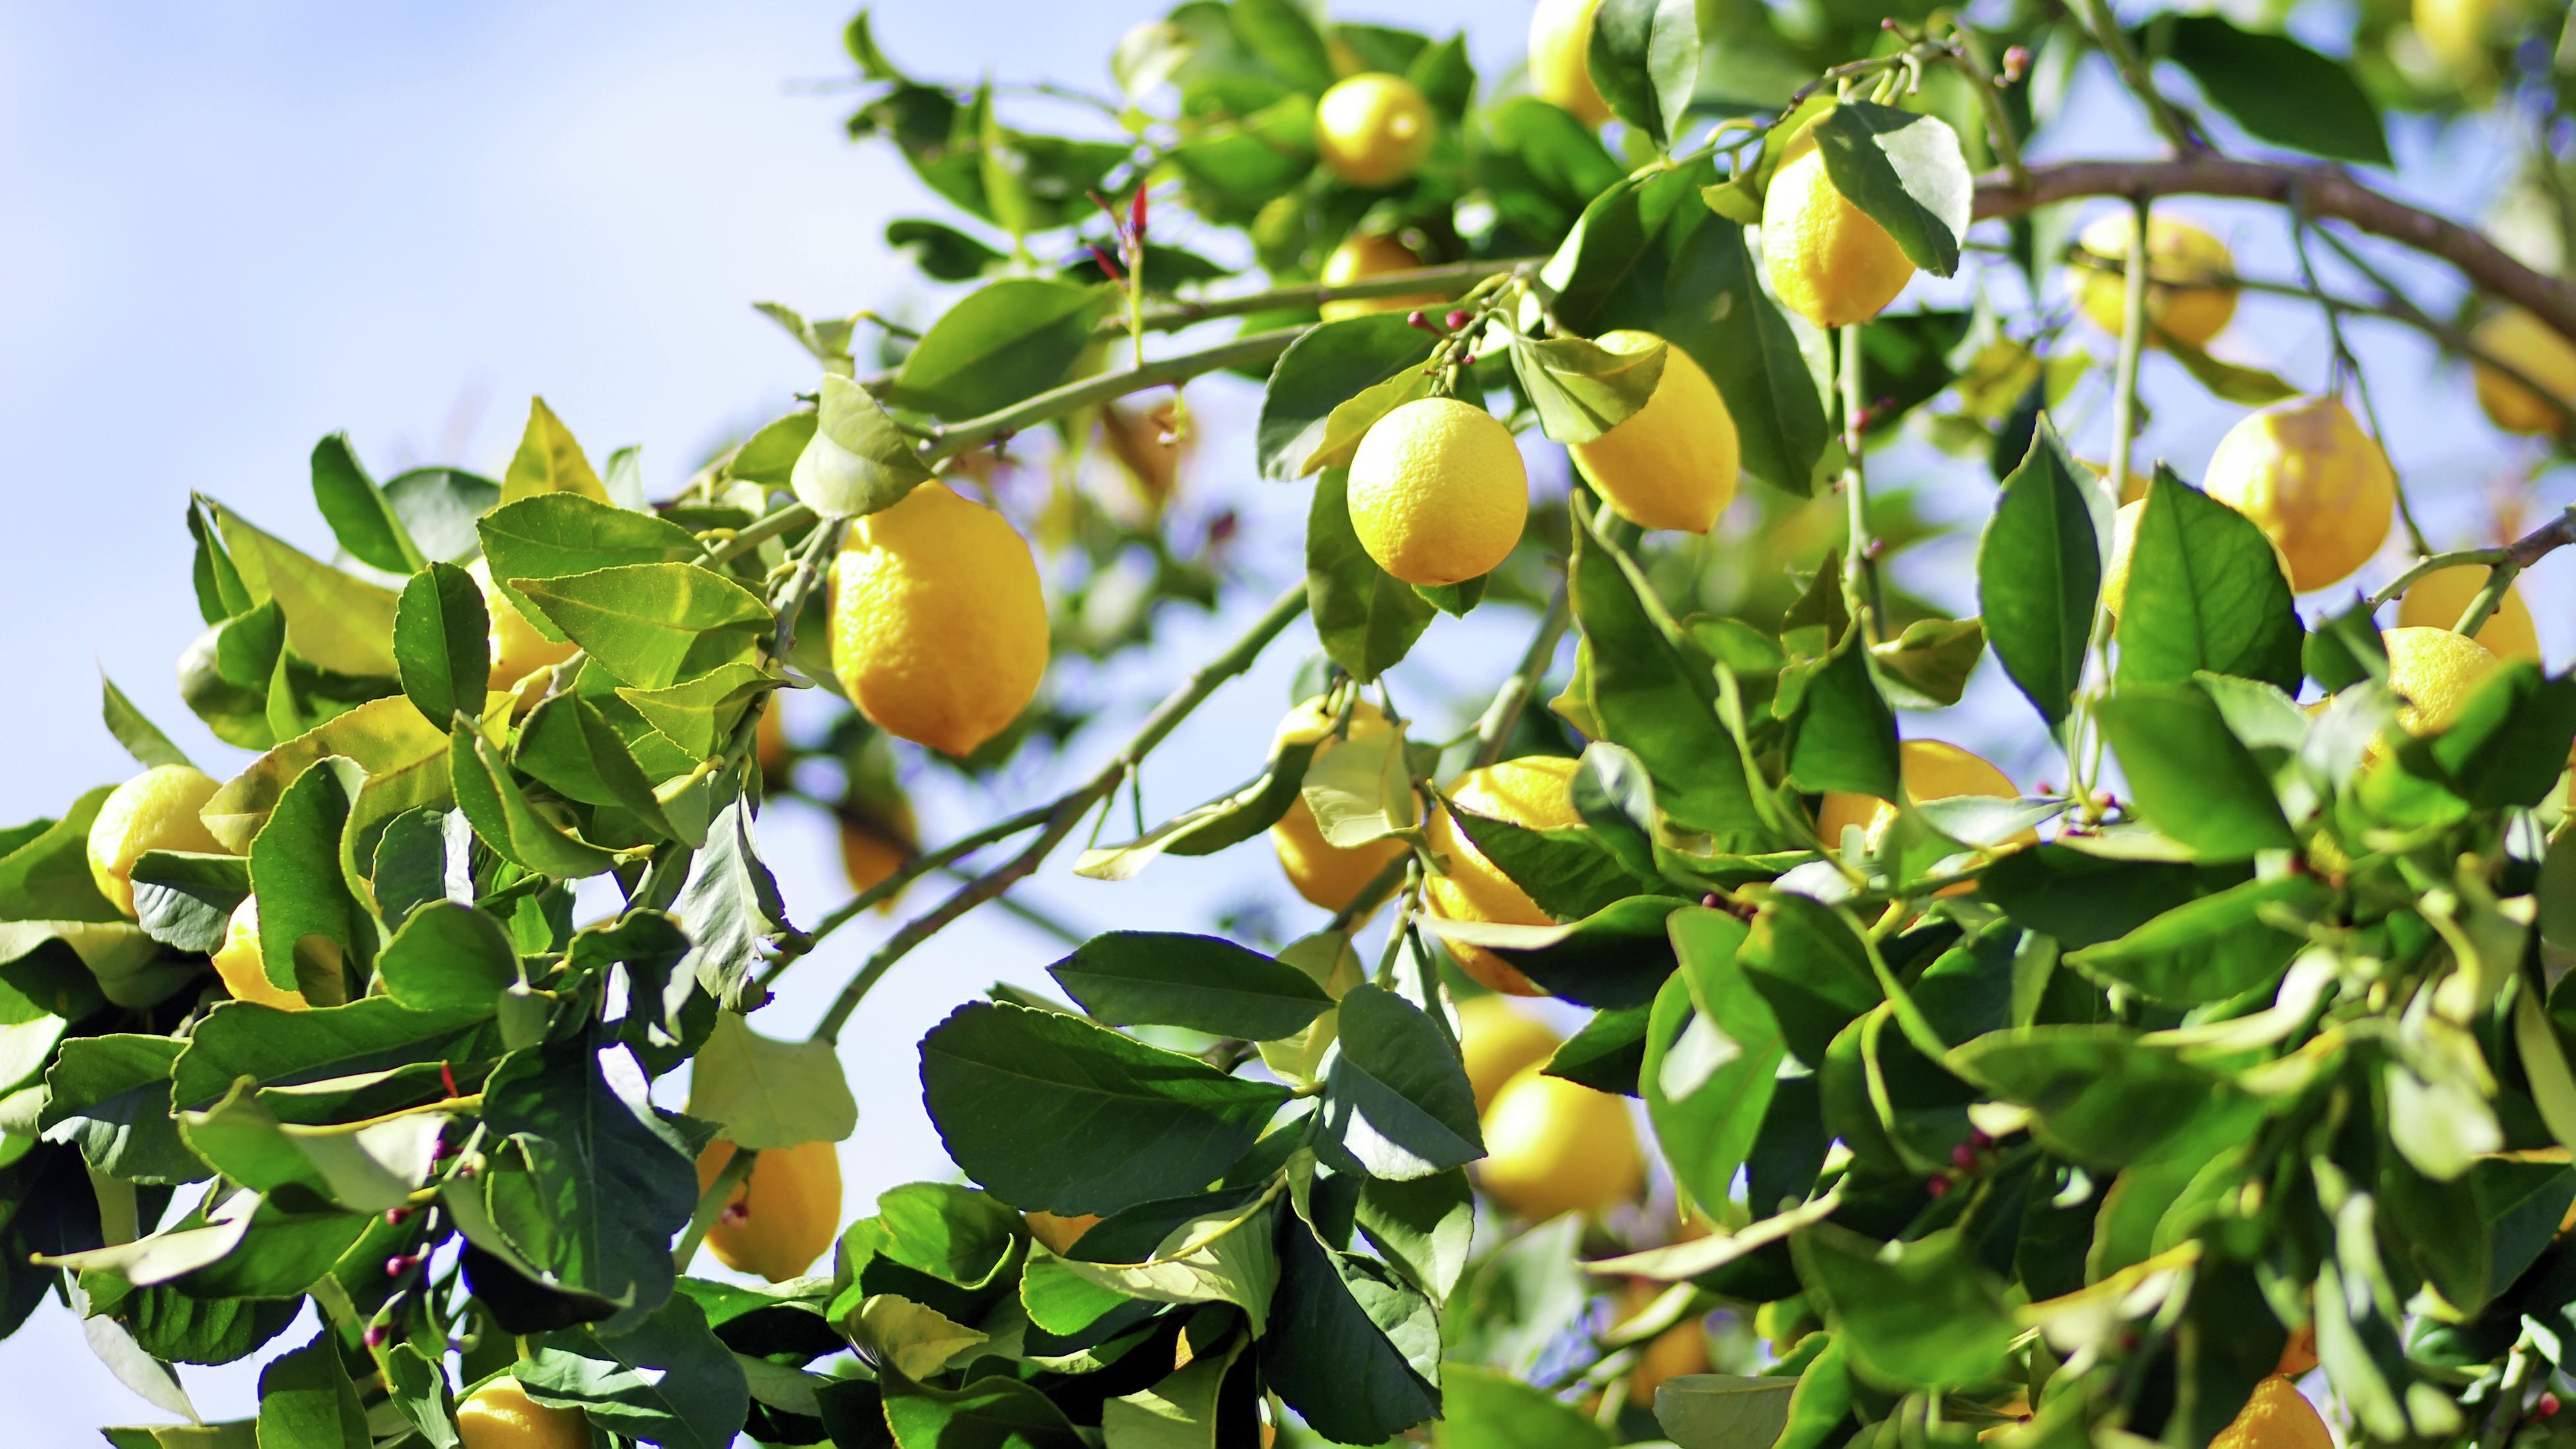 A large lemon tree with plenty of ripe lemons.